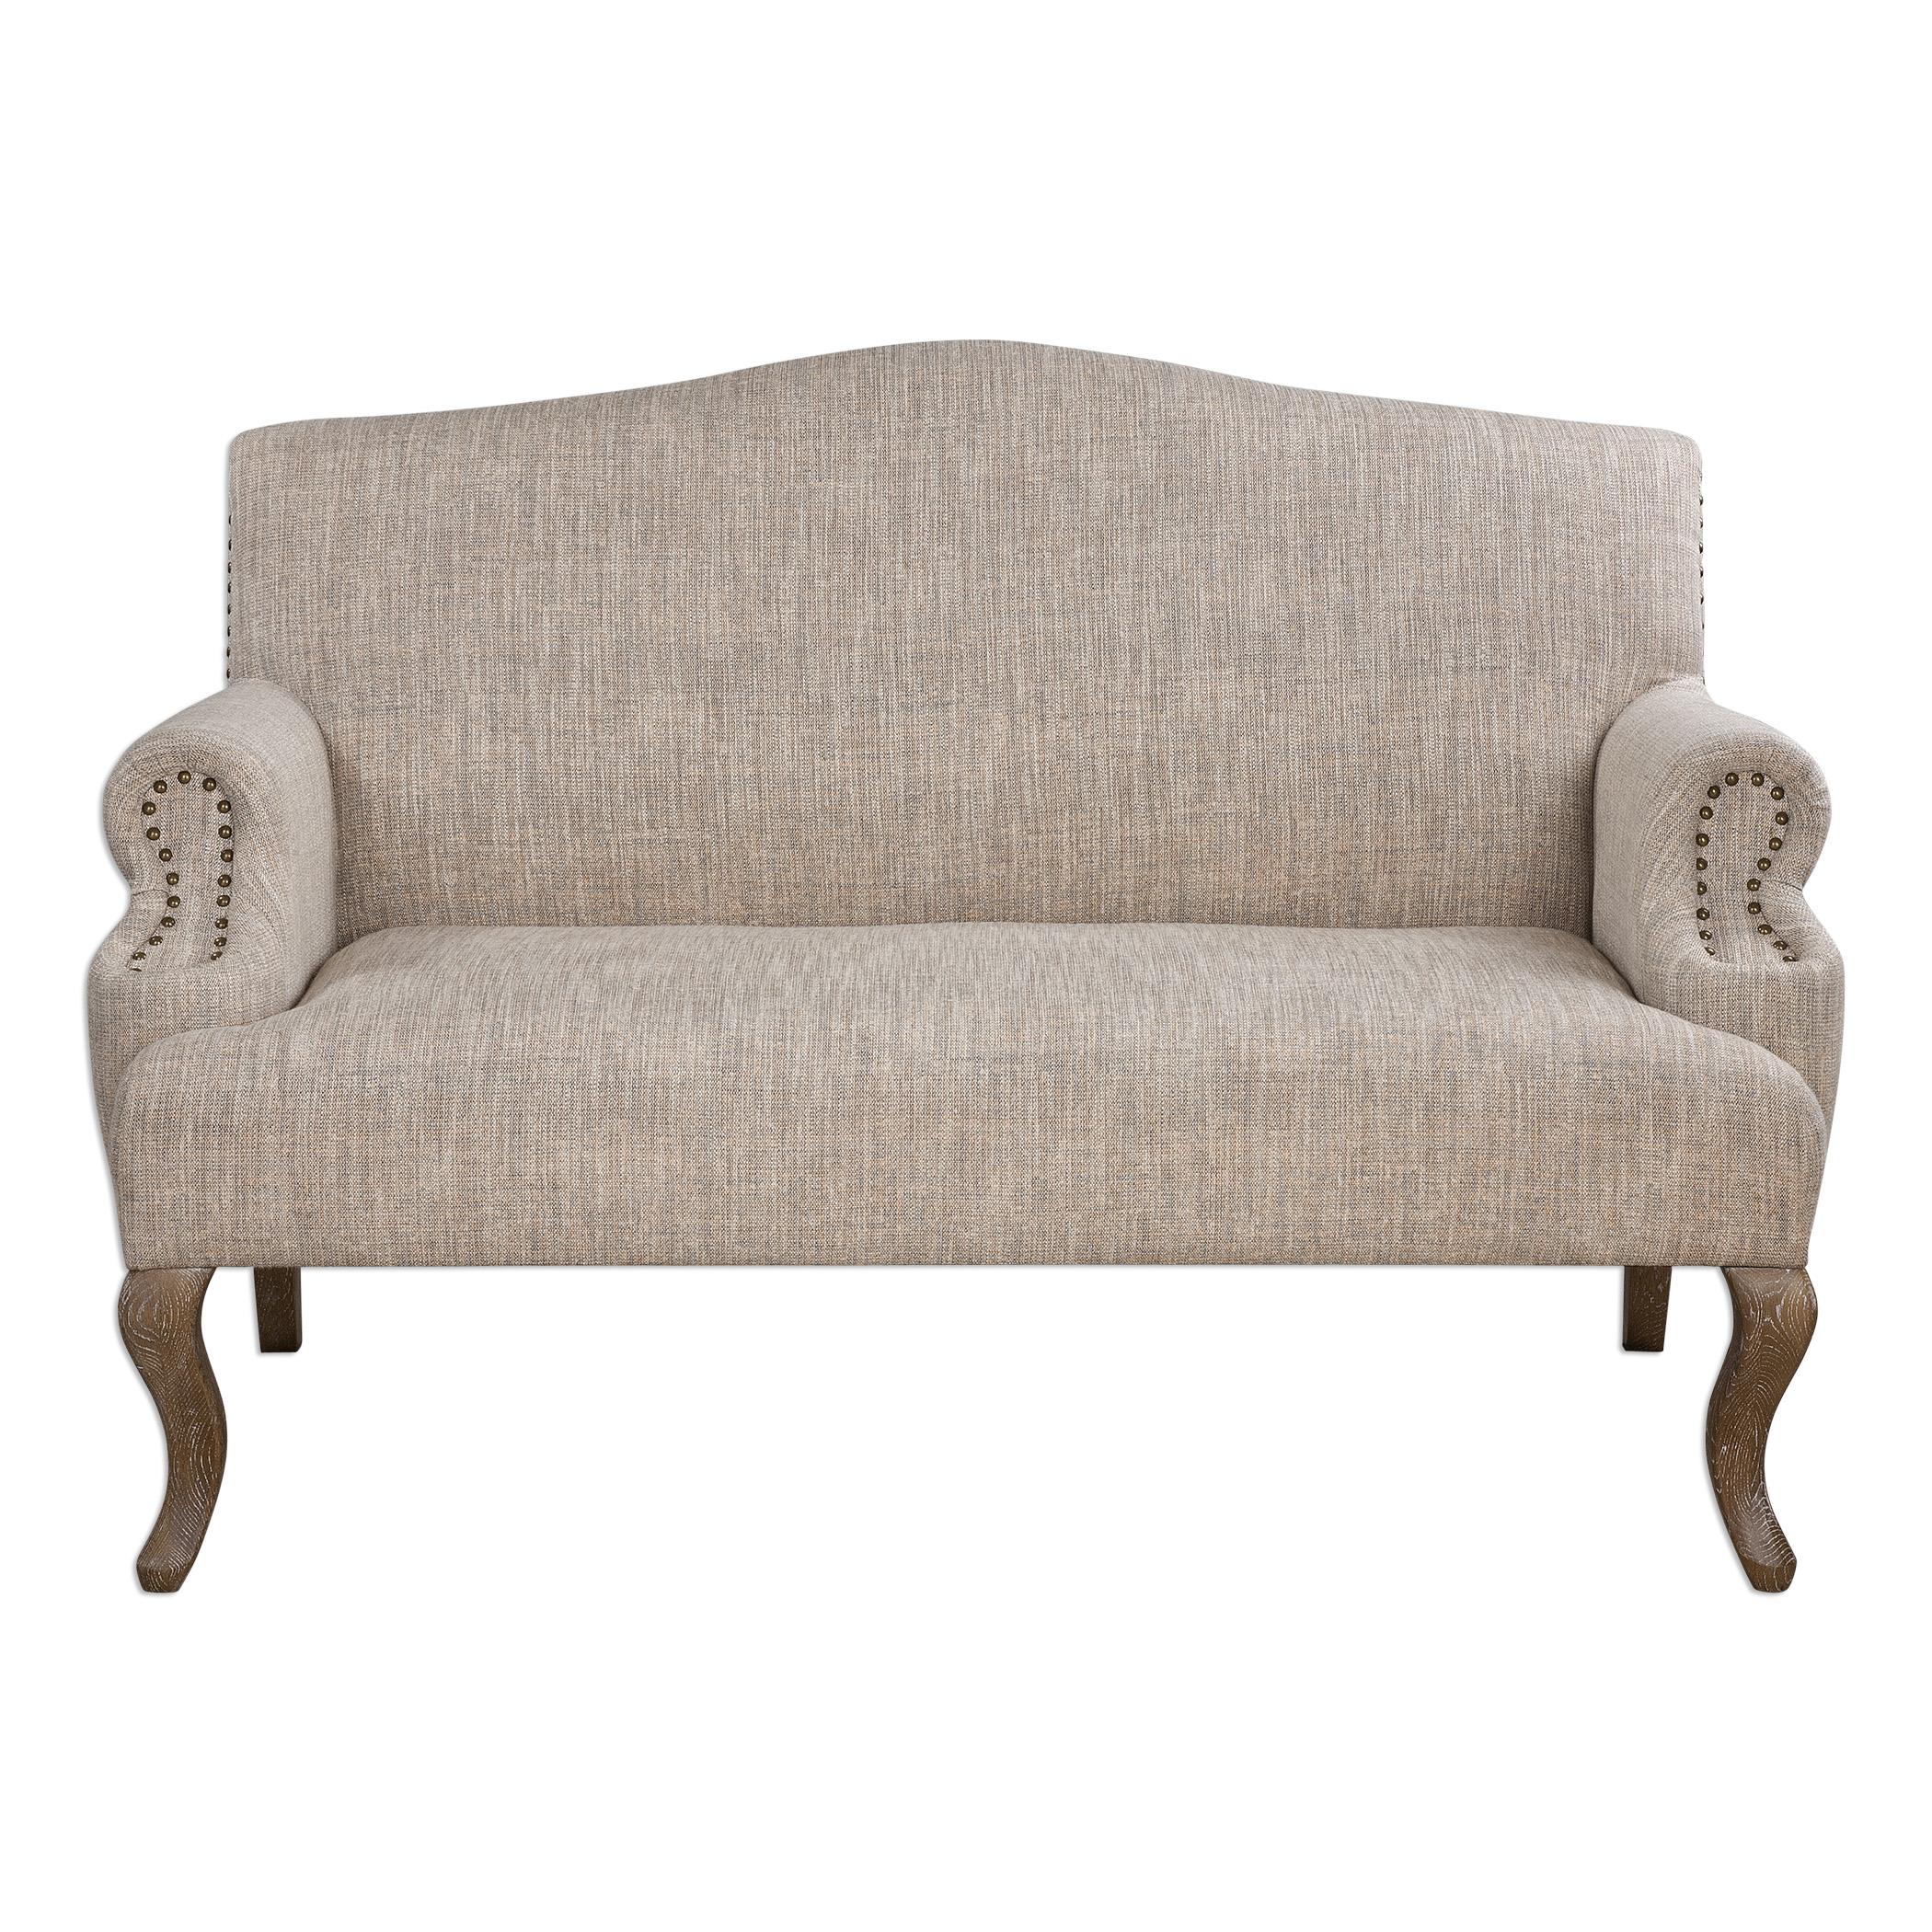 Uttermost Accent Furniture Rigina Soft Tan Loveseat - Item Number: 23290